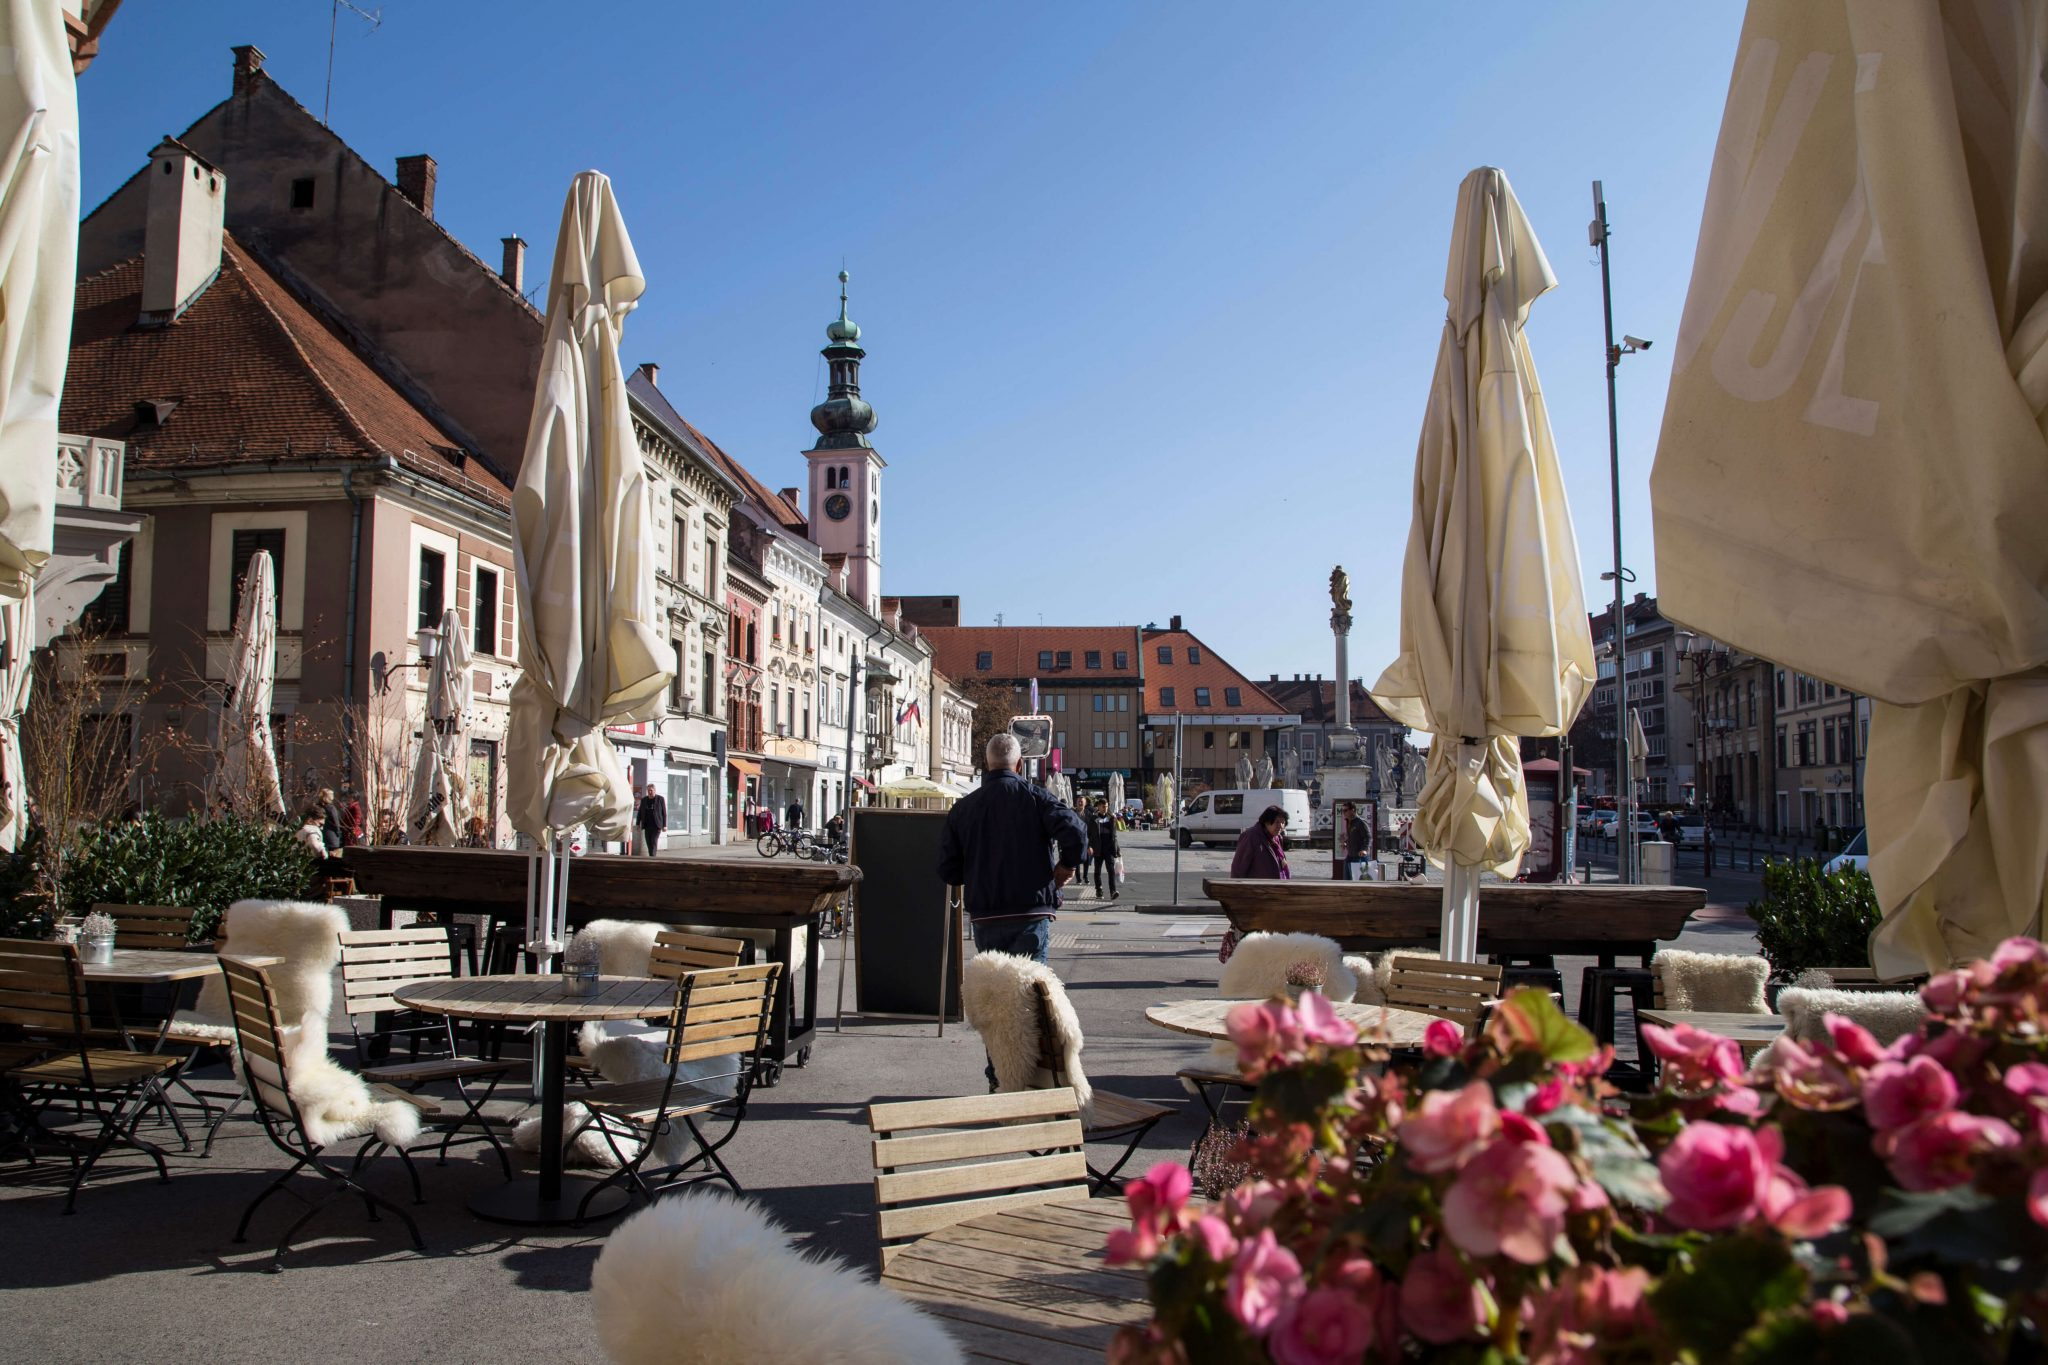 Žemljica, Restaurant- und Hoteltipp Gostilna Maribor, Marburg, Slowenien, Foto Anita Arneitz